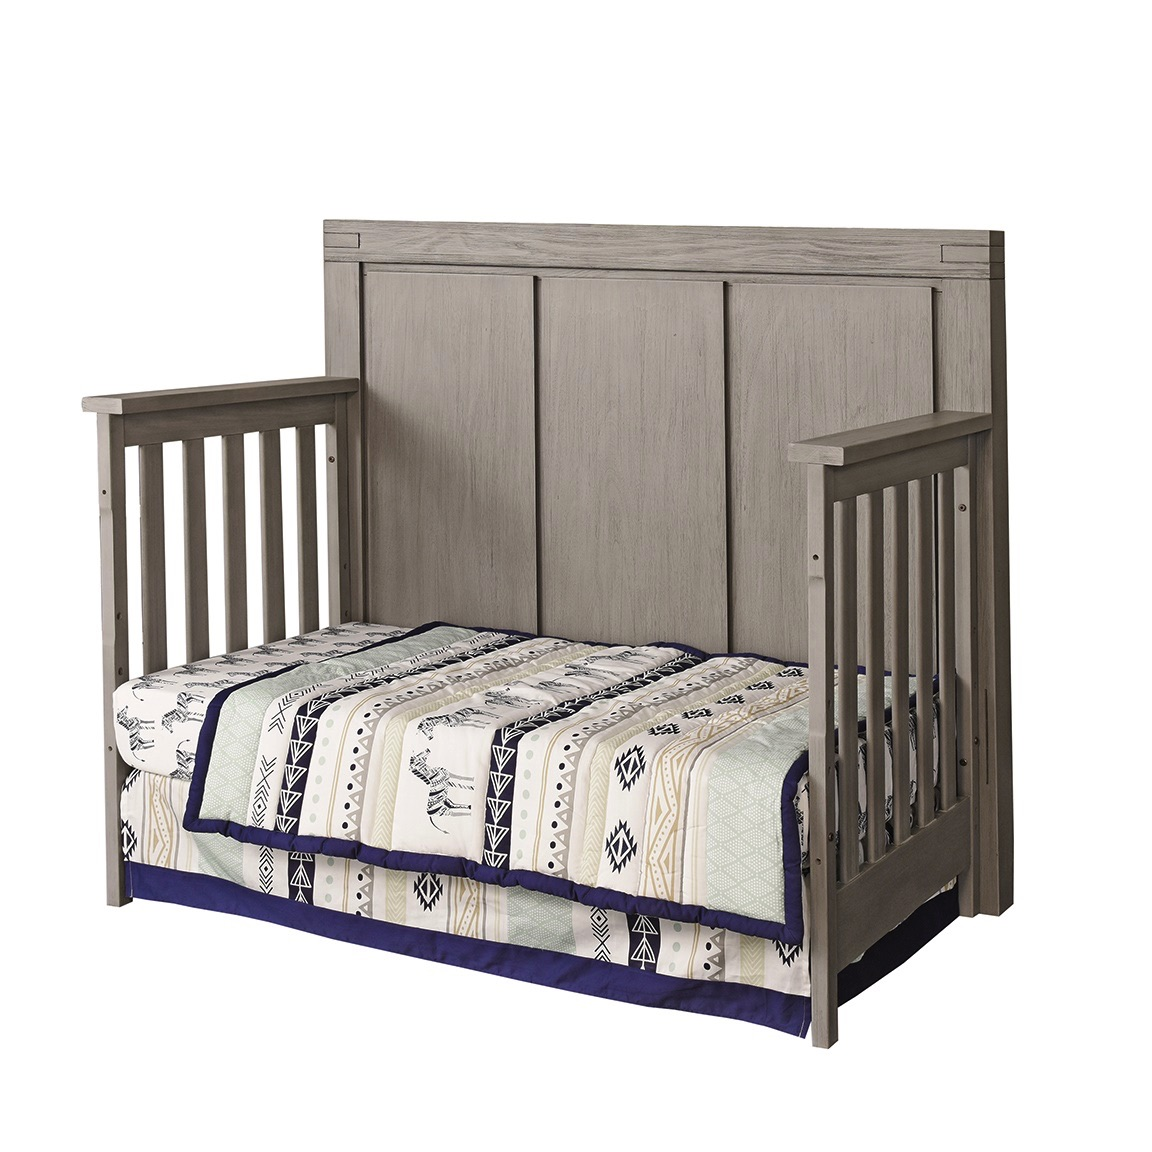 Pier One Baby Furniture: Piermont Rustic Stonington Gray